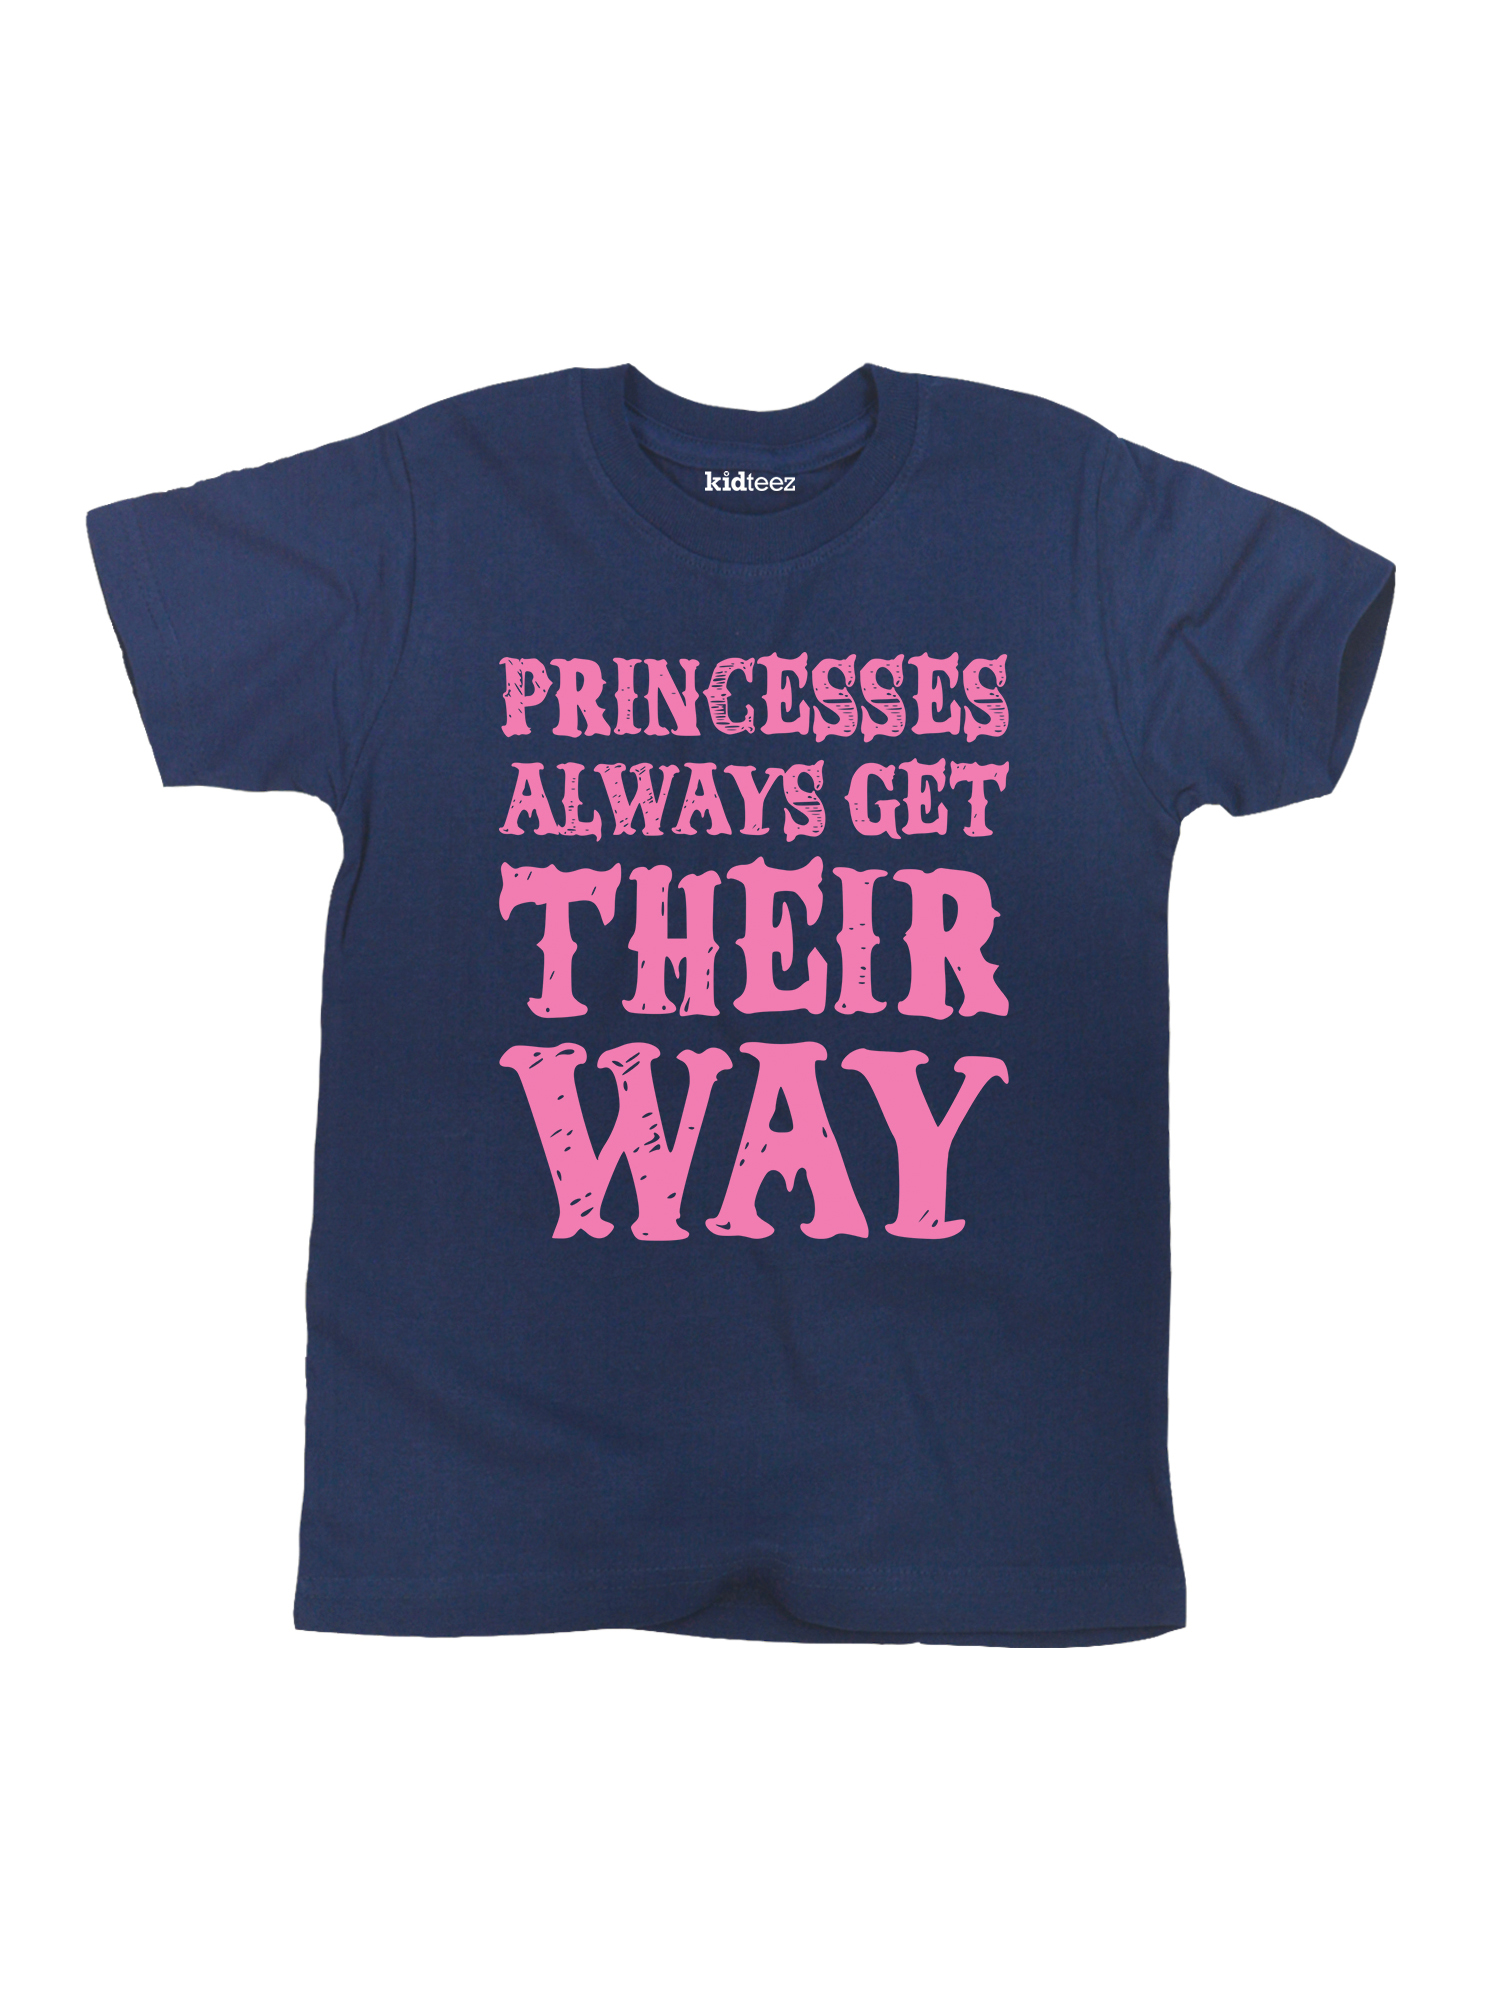 Princesses Always Get Their Way Cute Trendy-Toddler T-Shirt